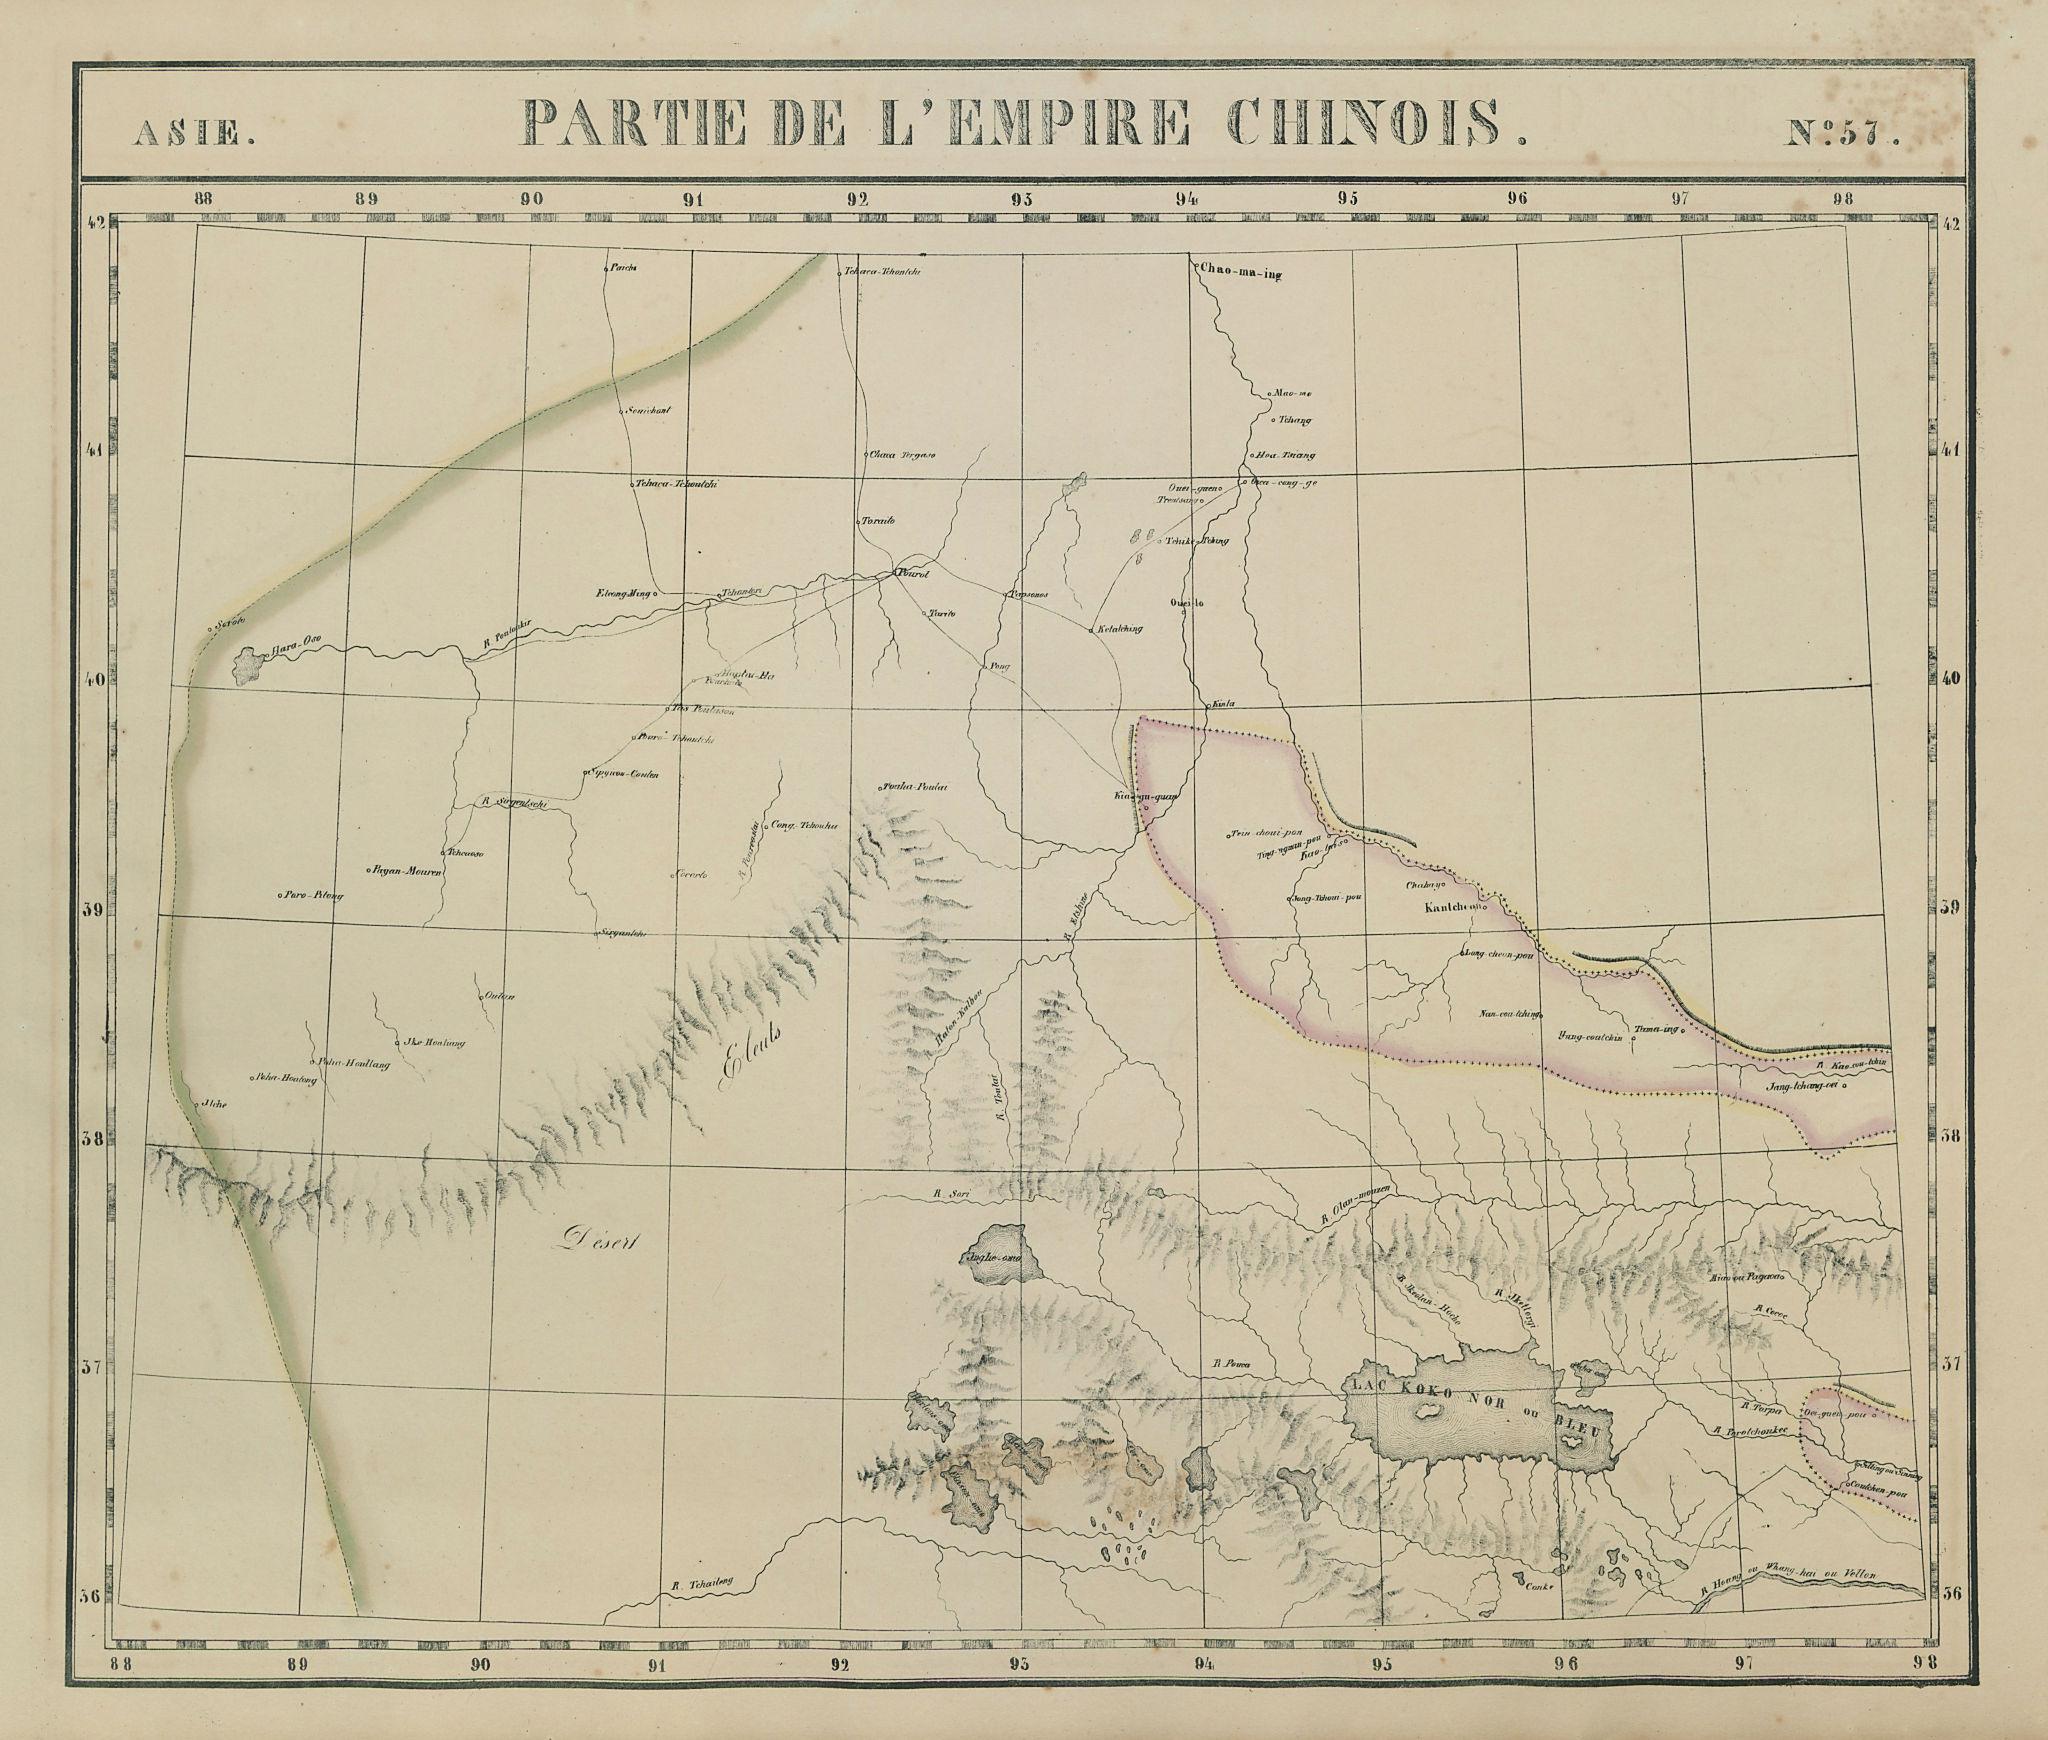 Asie. Empire Chinois #57 Qinghai Gansu Xinjiang China. VANDERMAELEN 1827 map